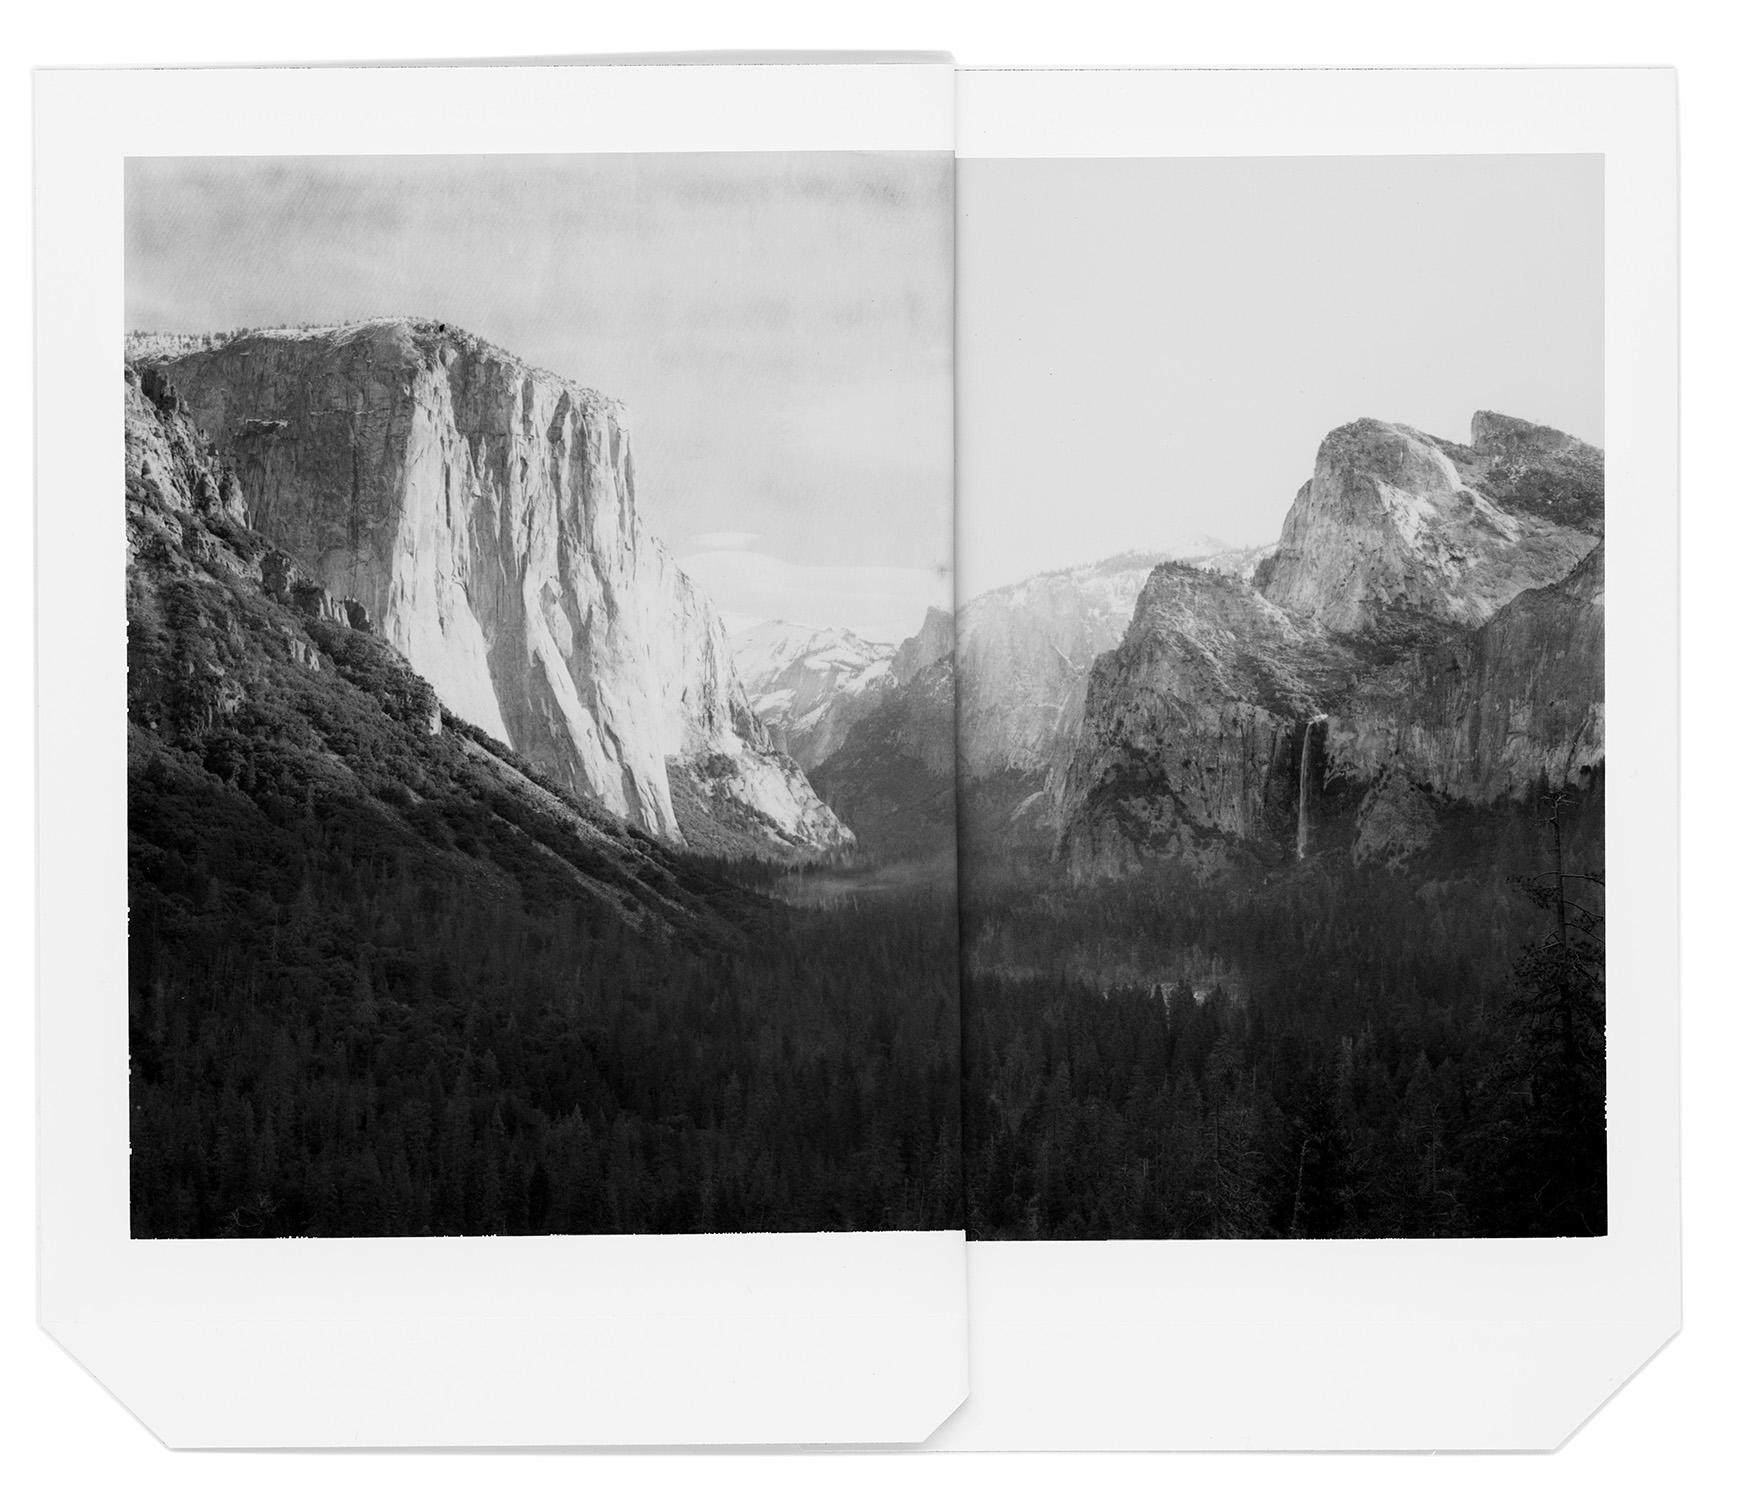 181216-SD-Yosemite-Polaroid-02.jpg